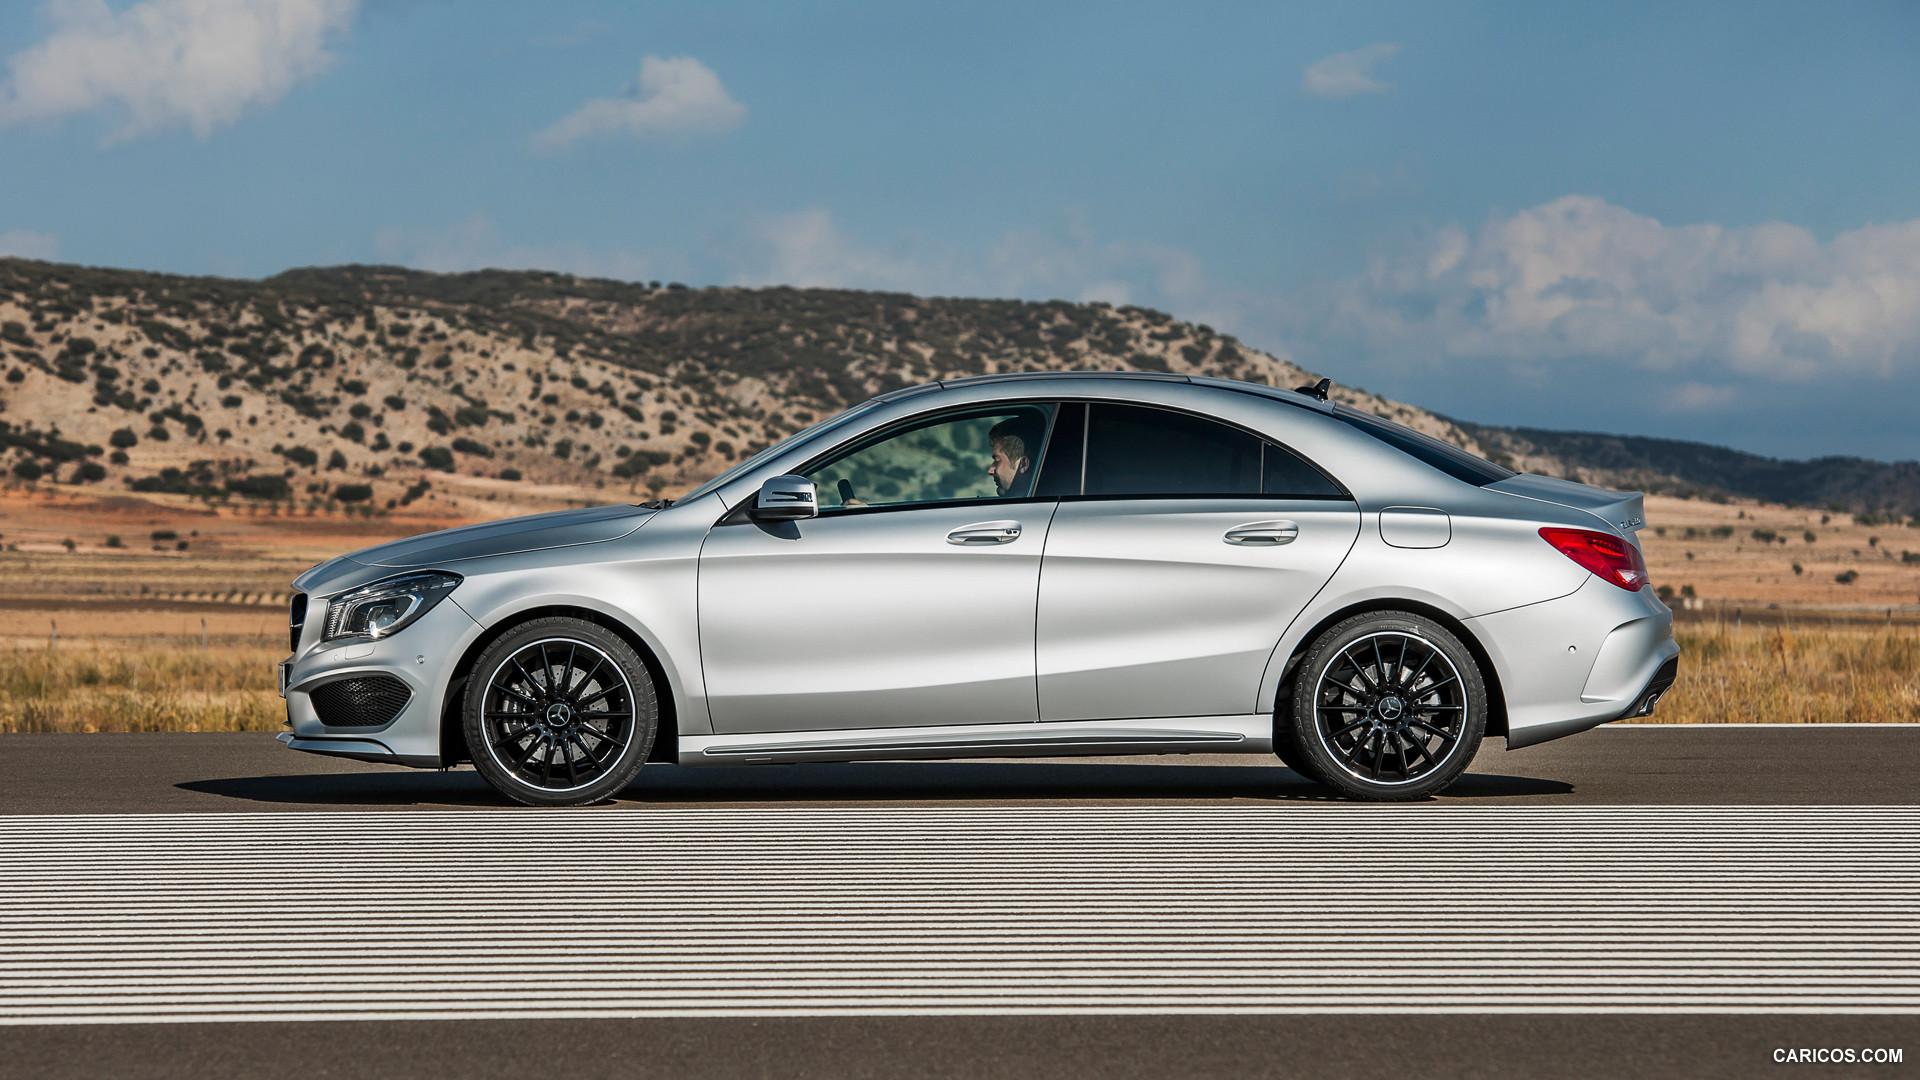 2014 Mercedes-Benz CLA-Class #4 Mercedes-Benz CLA-Class #4